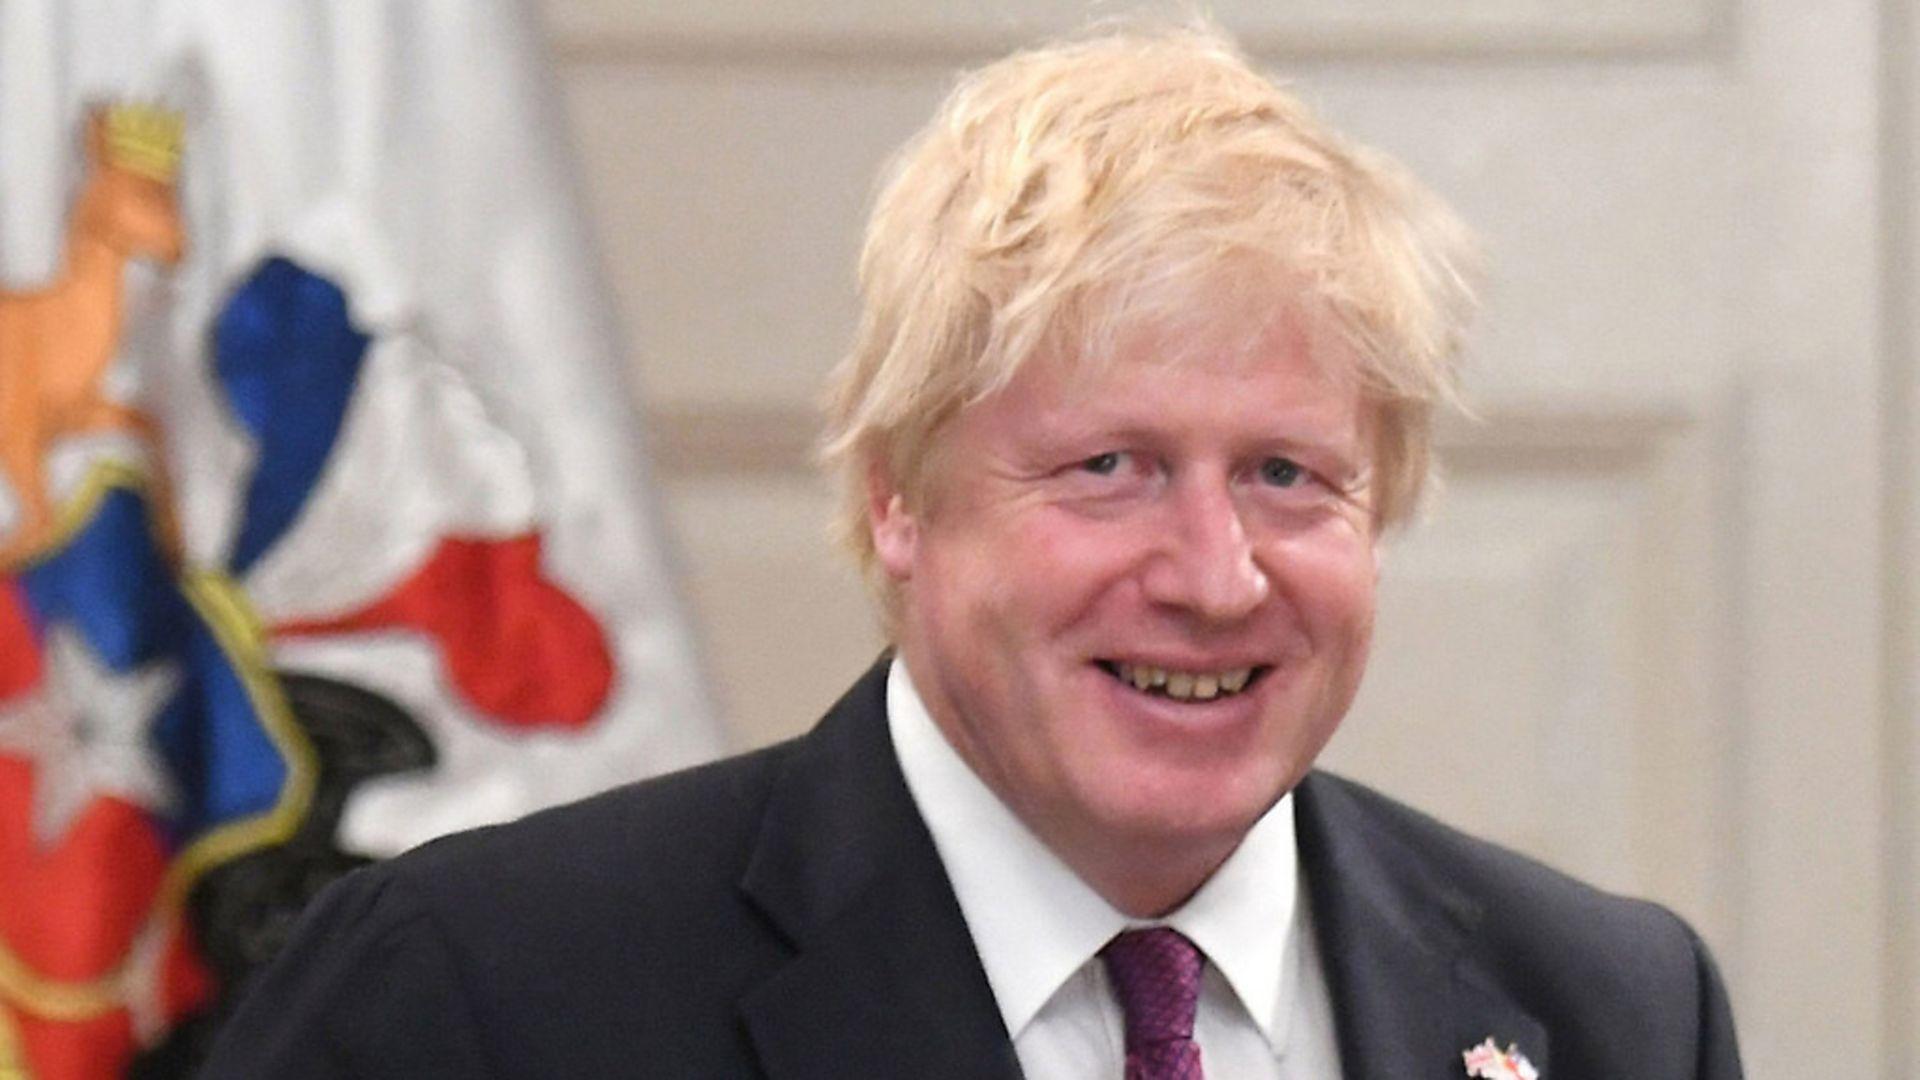 Foreign Secretary Boris Johnson Photo: PA - Credit: PA Archive/PA Images